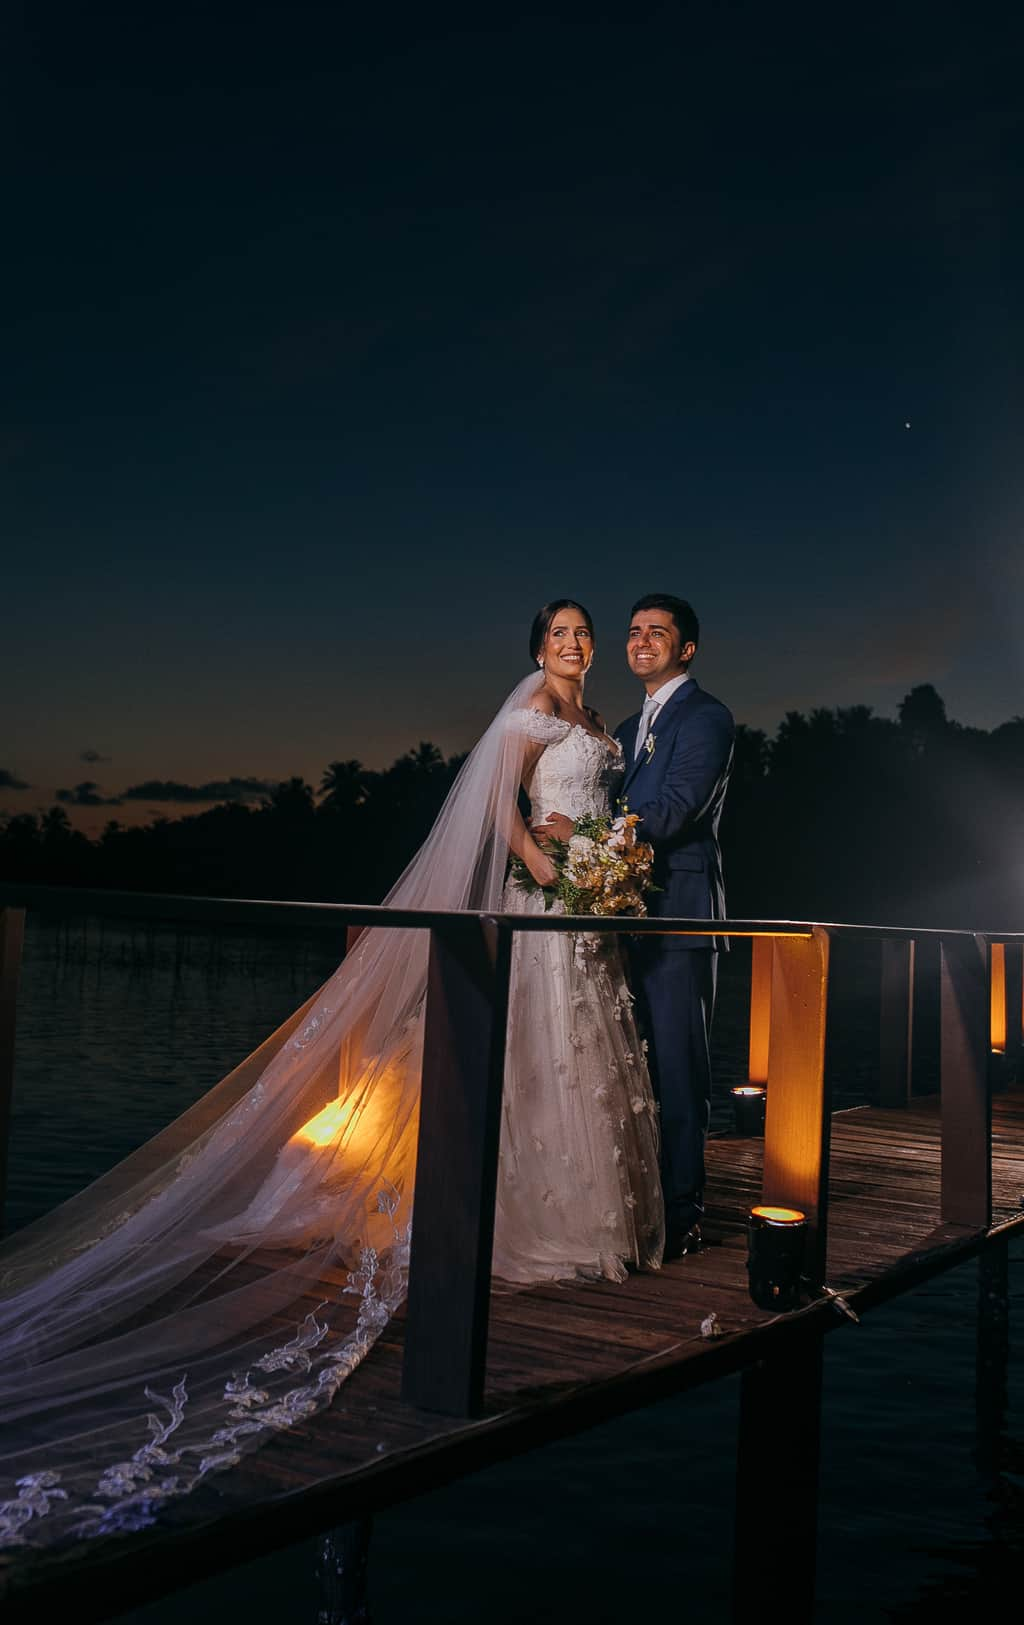 Casamento-Gardenia-e-Marcos-Antonio-Paulo-Bezerra-Joao-Curvelo-Carol-Maiorano0921